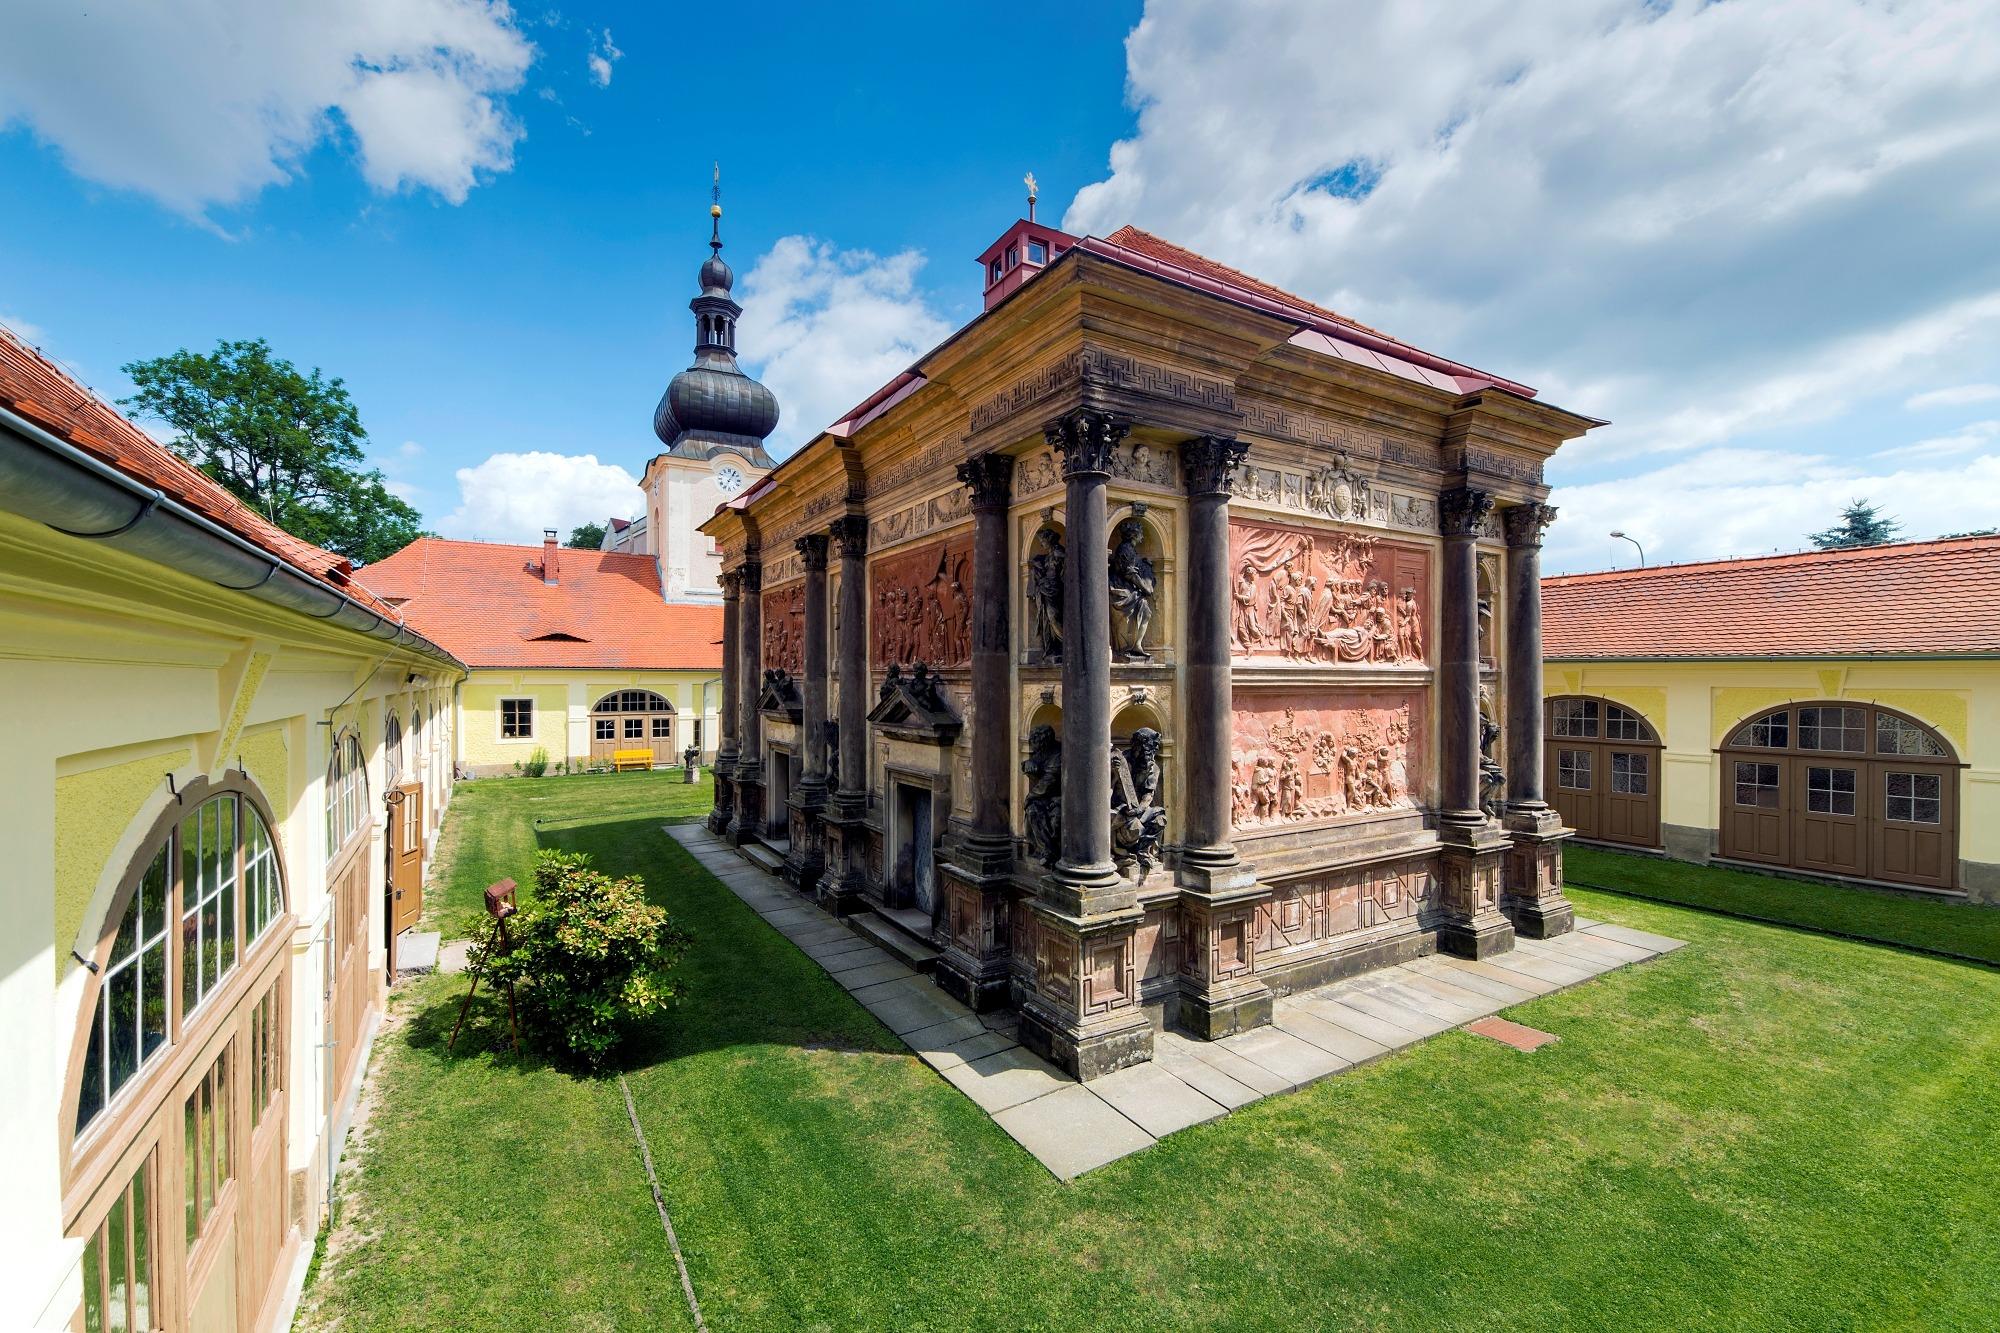 Loretánská-kaple_Loretokapelle-in-Rumburk4